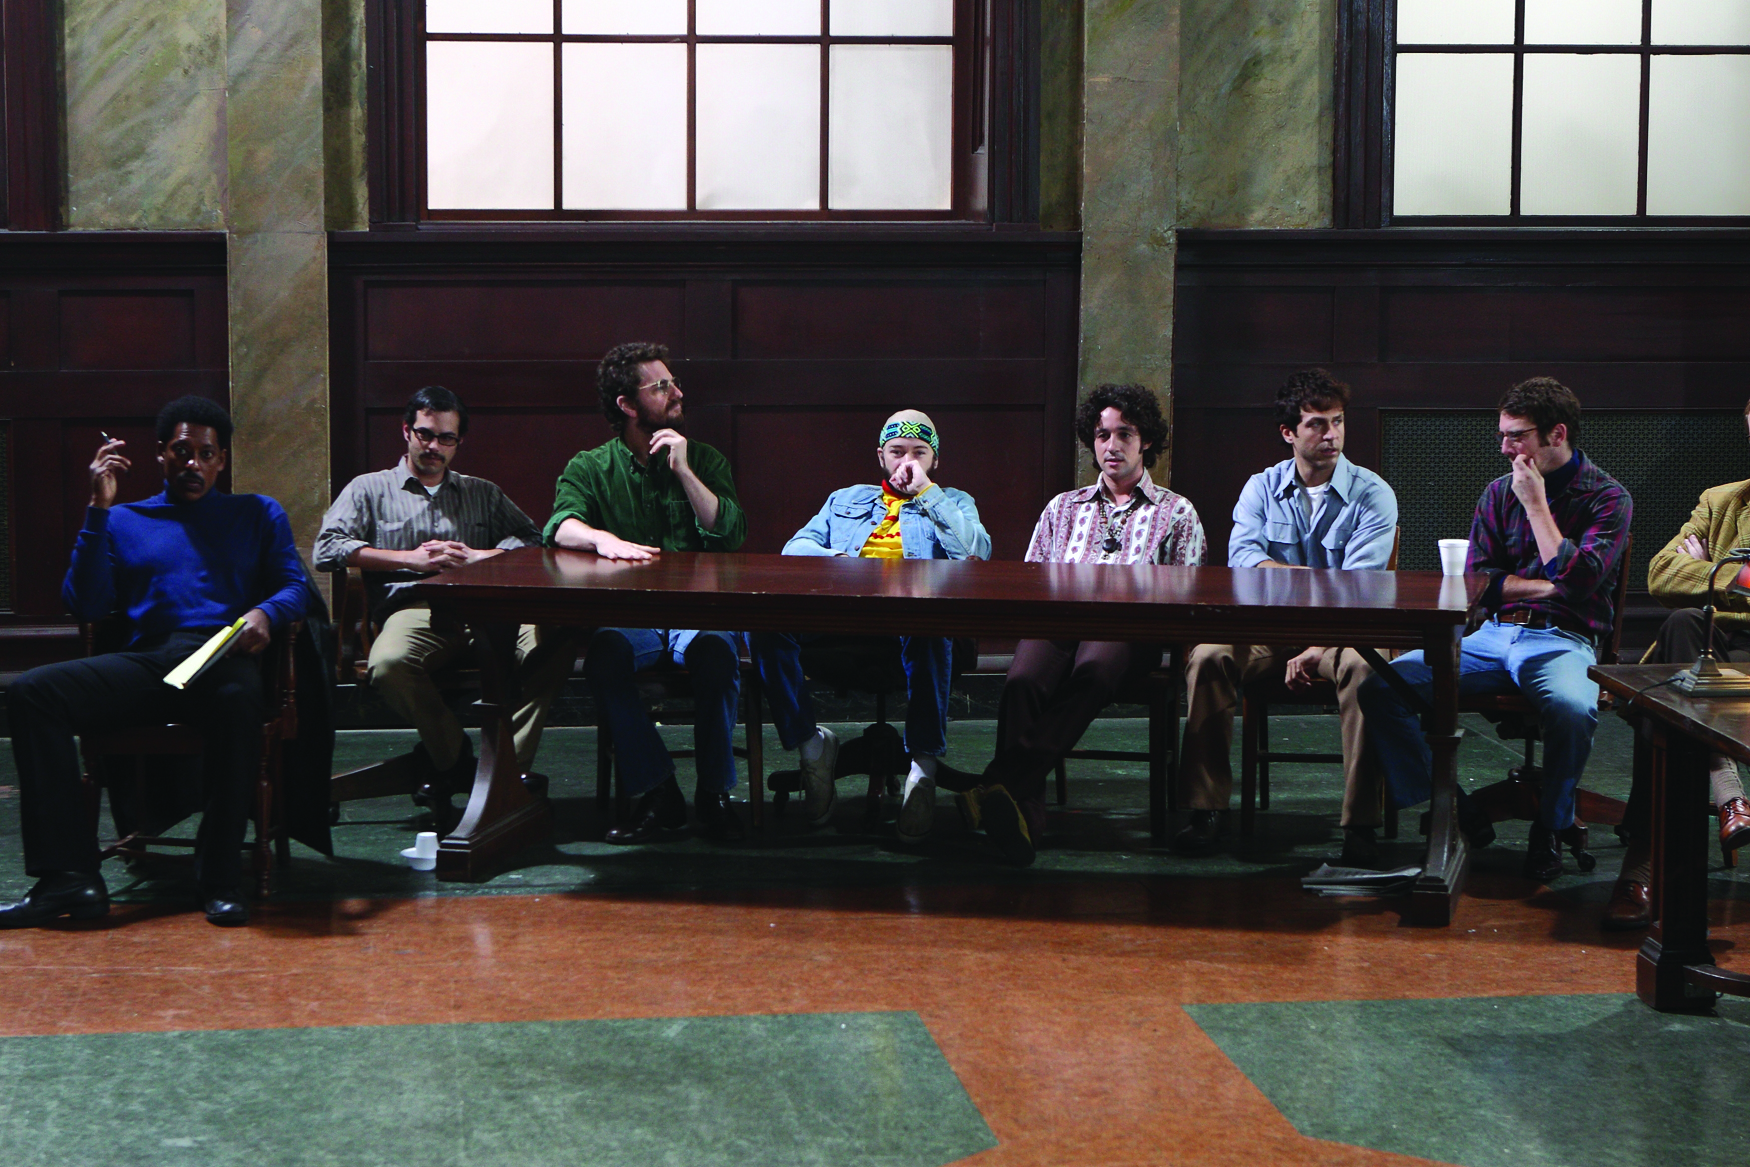 Danny Masterson, Thomas Ian Nicholas, Jamie Elman, Andy Hirsch, Orlando Jones, David Julian Hirsh, and Aaron Abrams in The Chicago 8 (2011)